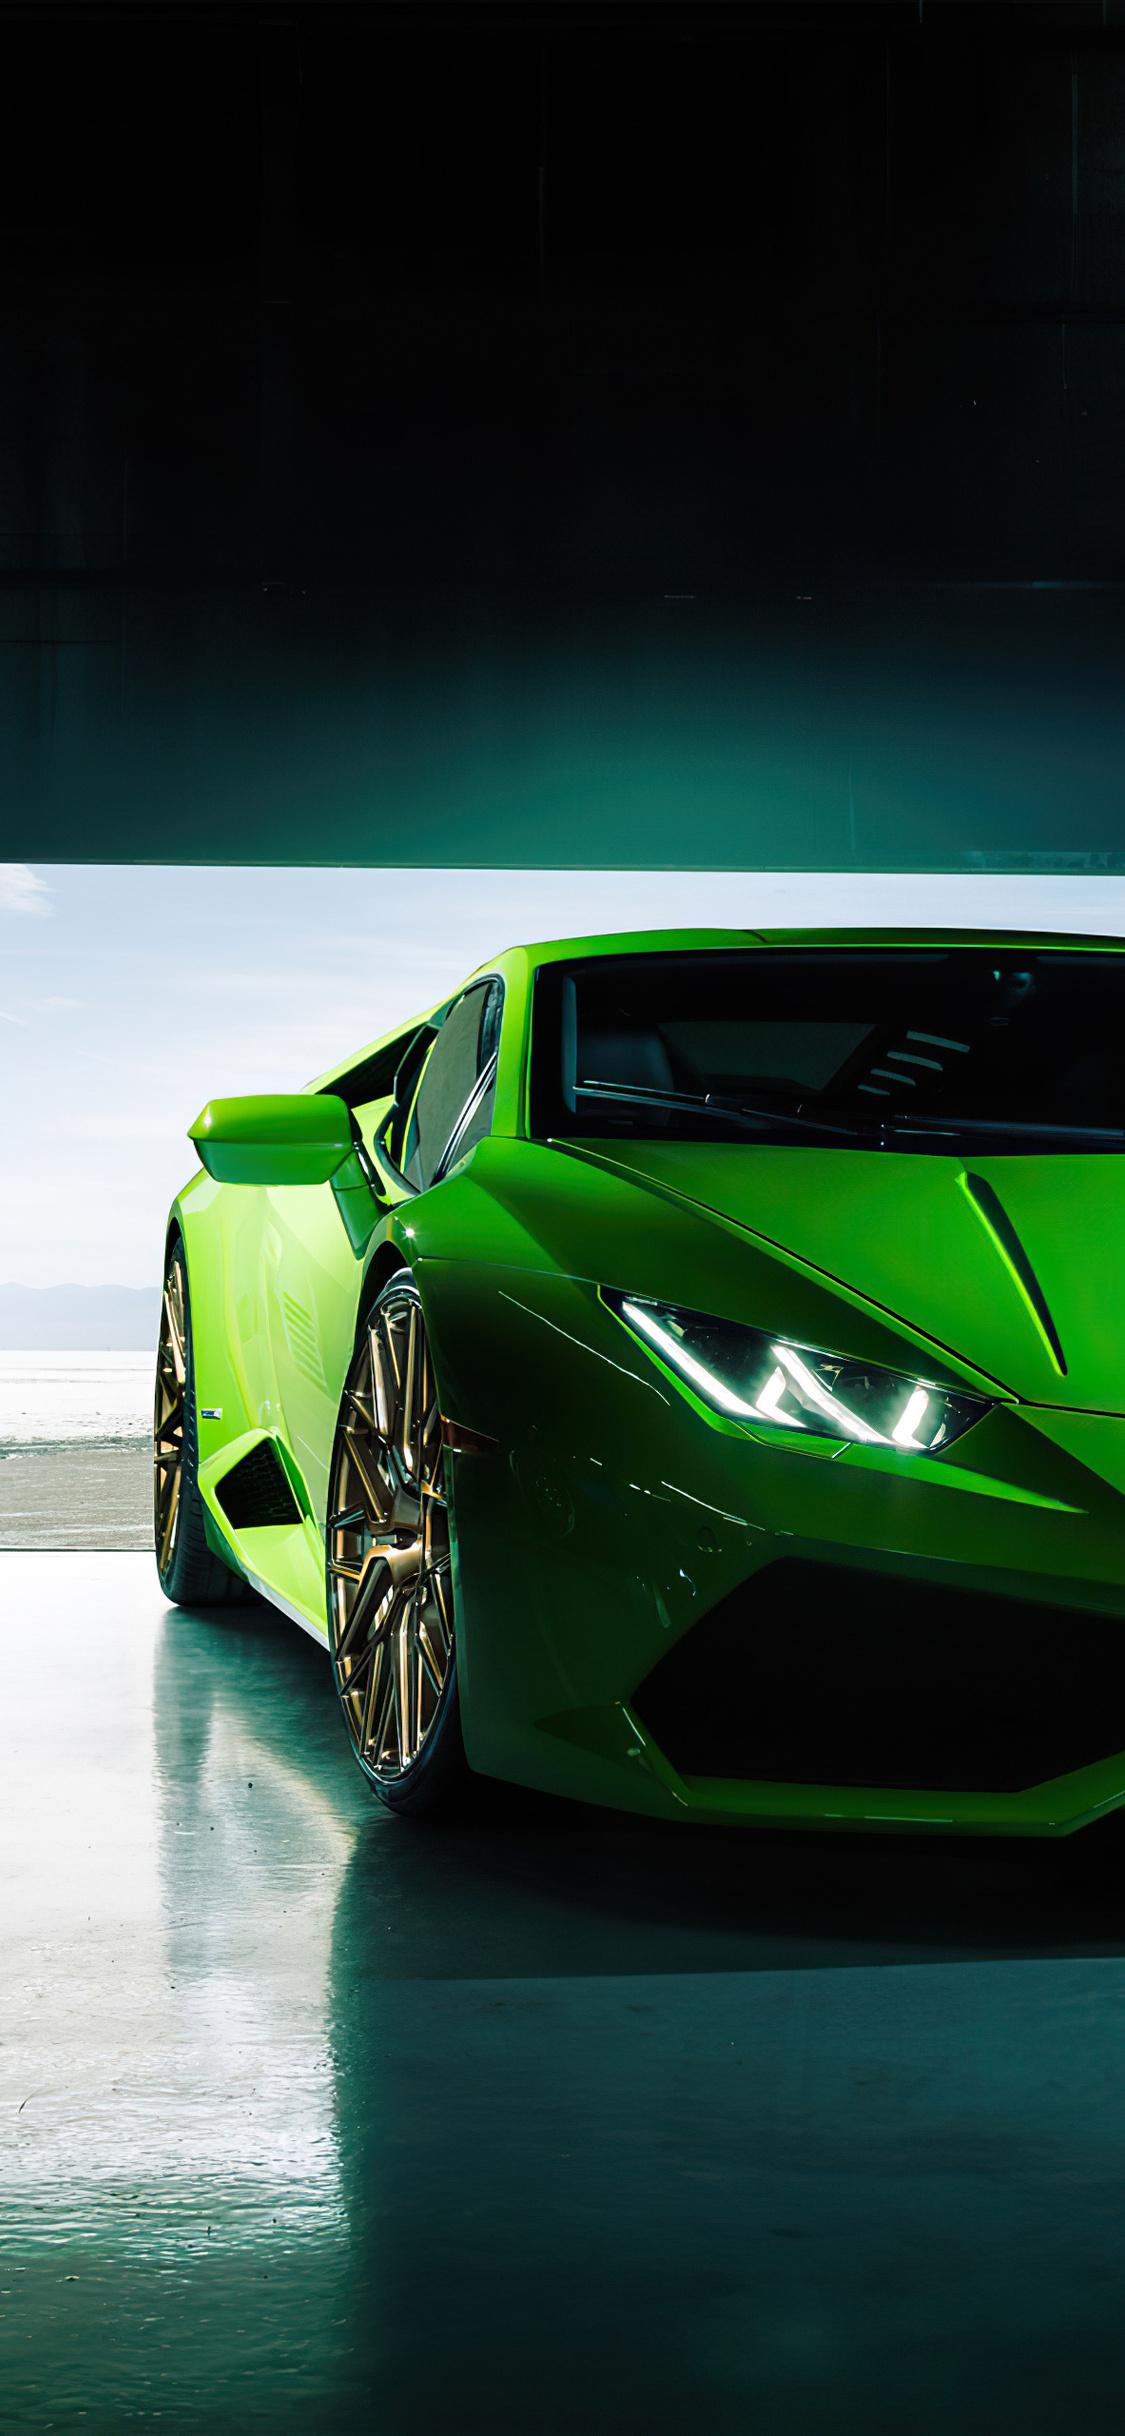 1125x2436 4k Green Lamborghini Huracan 2020 Iphone XS ...